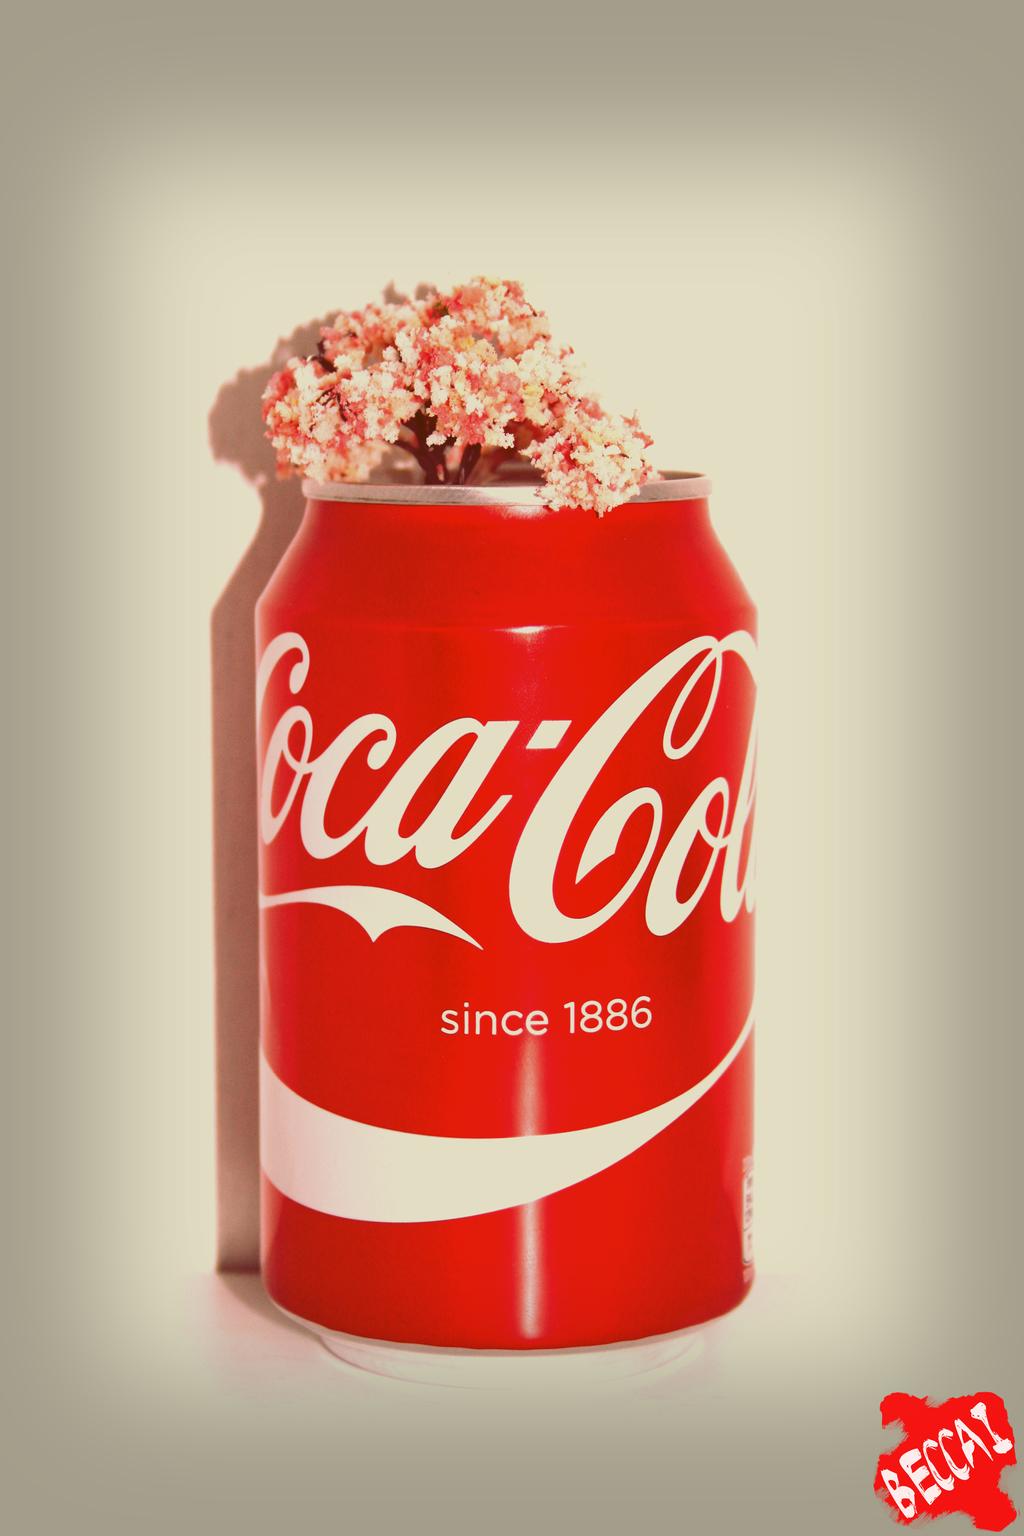 Most recent image: Sakura No Coca-Cola